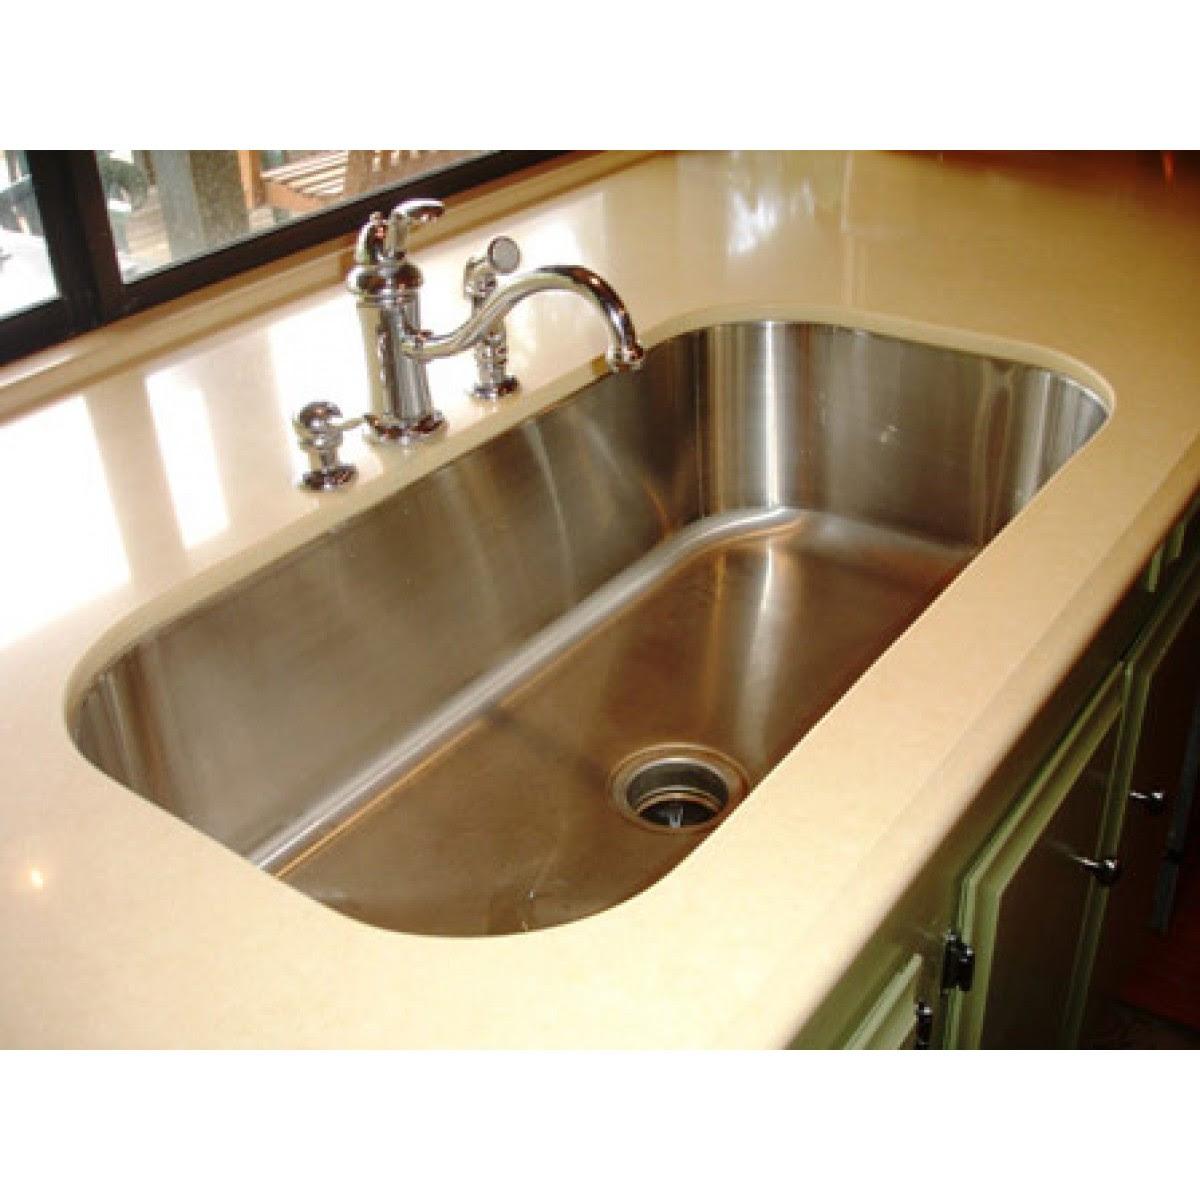 30 Inch Stainless Steel Undermount Single Bowl Kitchen ...